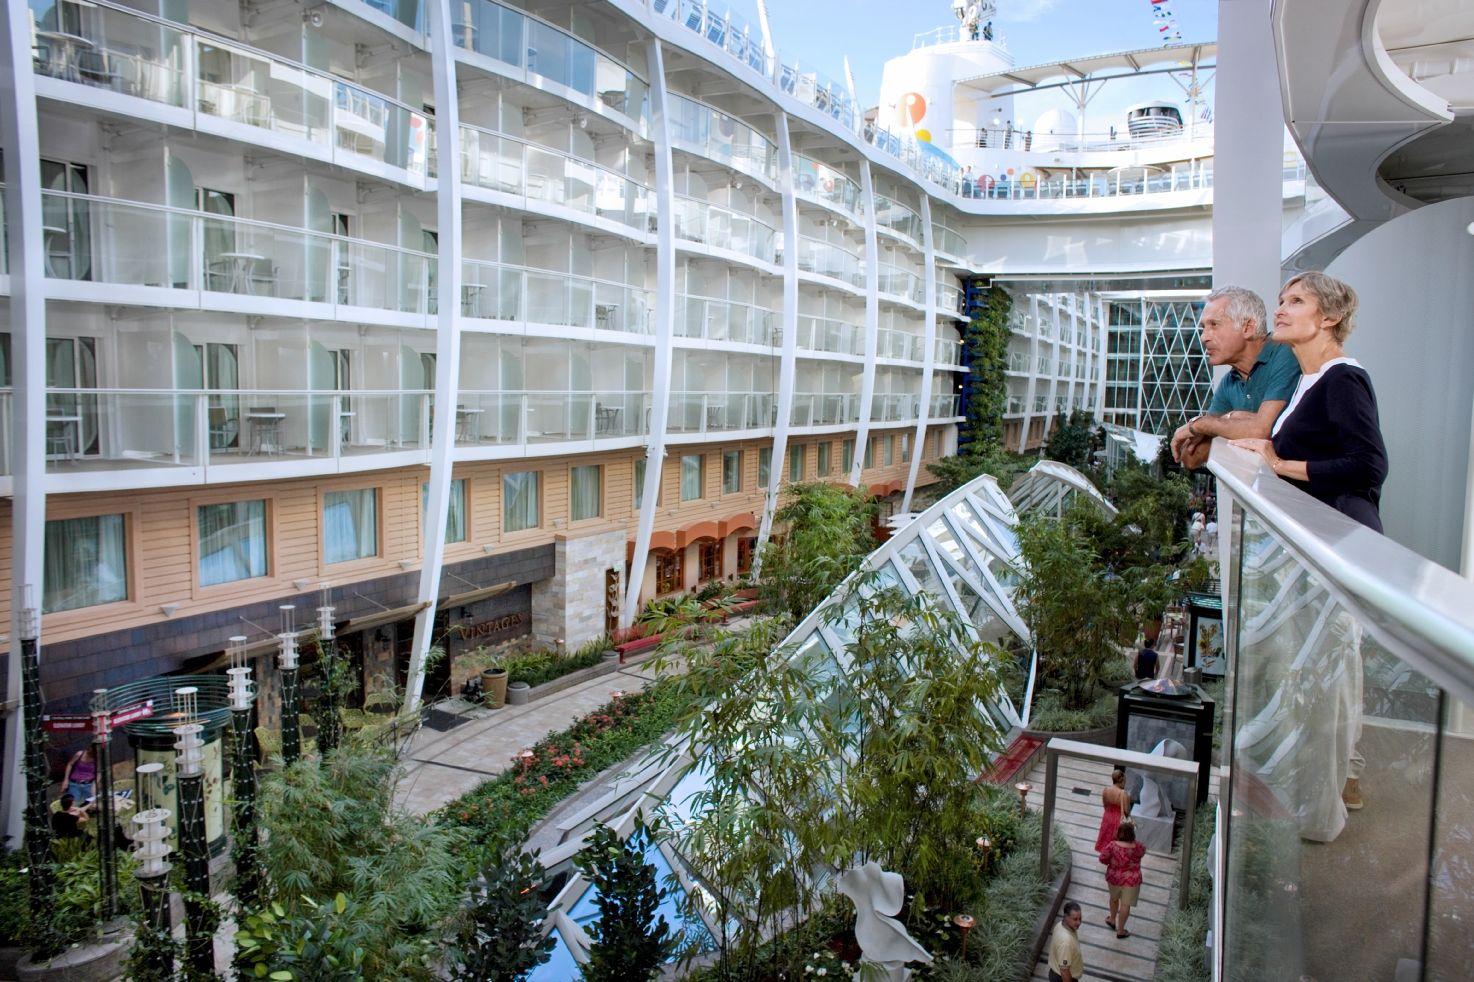 Allure Of The Seas Het Grootste Cruiseschip Ter Wereld Foto S Royal Caribbean Cruise Ship Harmony Of The Seas Royal Caribbean Cruise